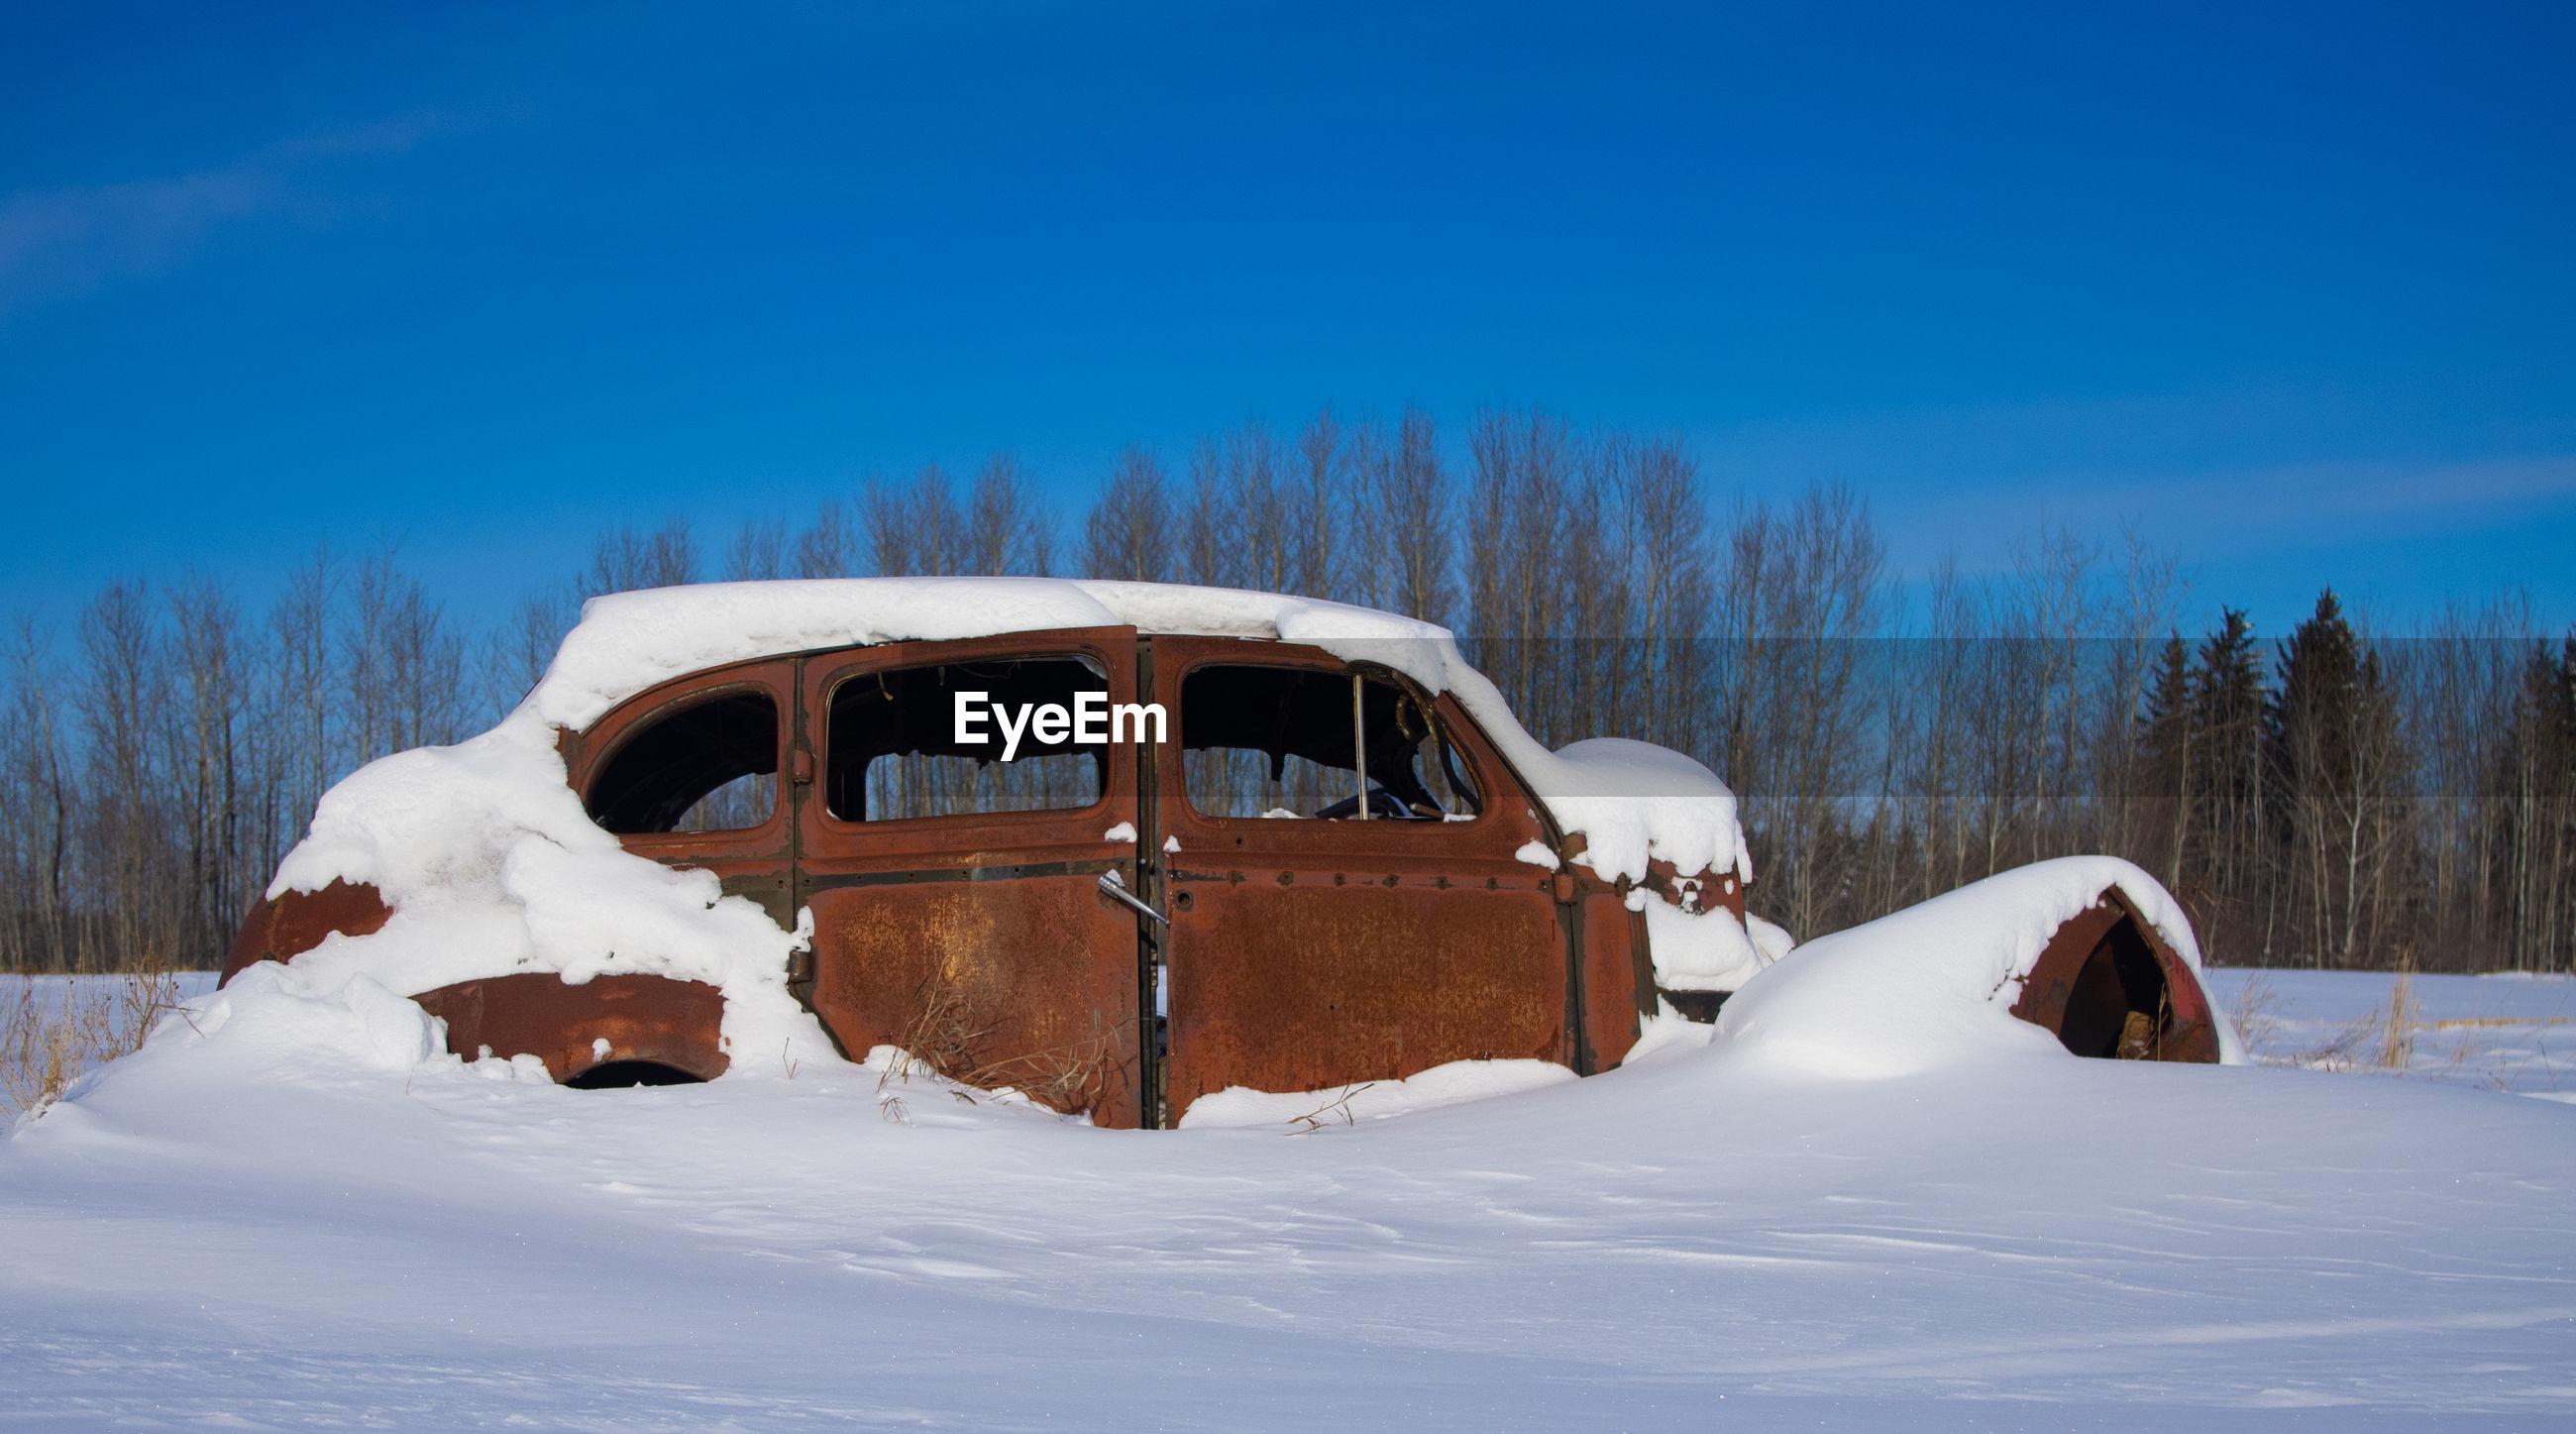 SNOW COVERED CAR ON LAND AGAINST SKY